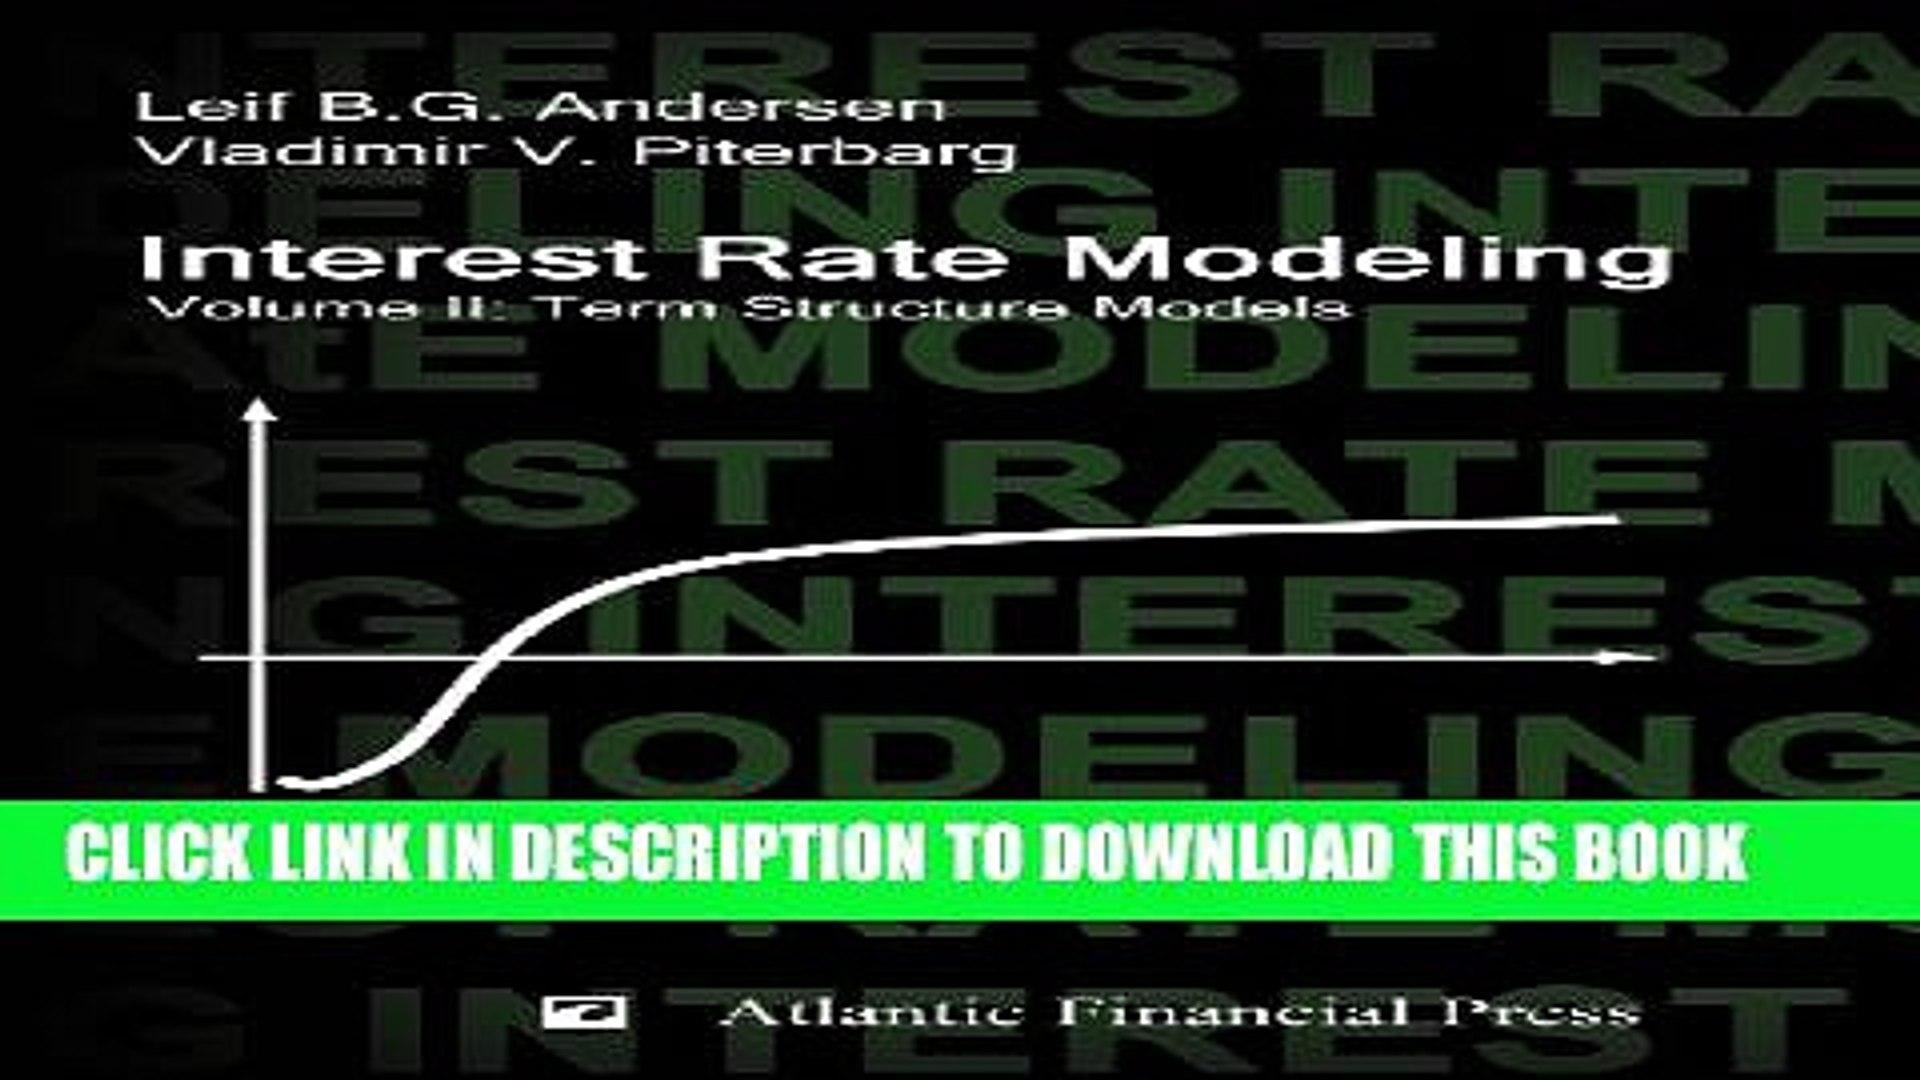 Andersen piterbarg interest rate modeling pdf